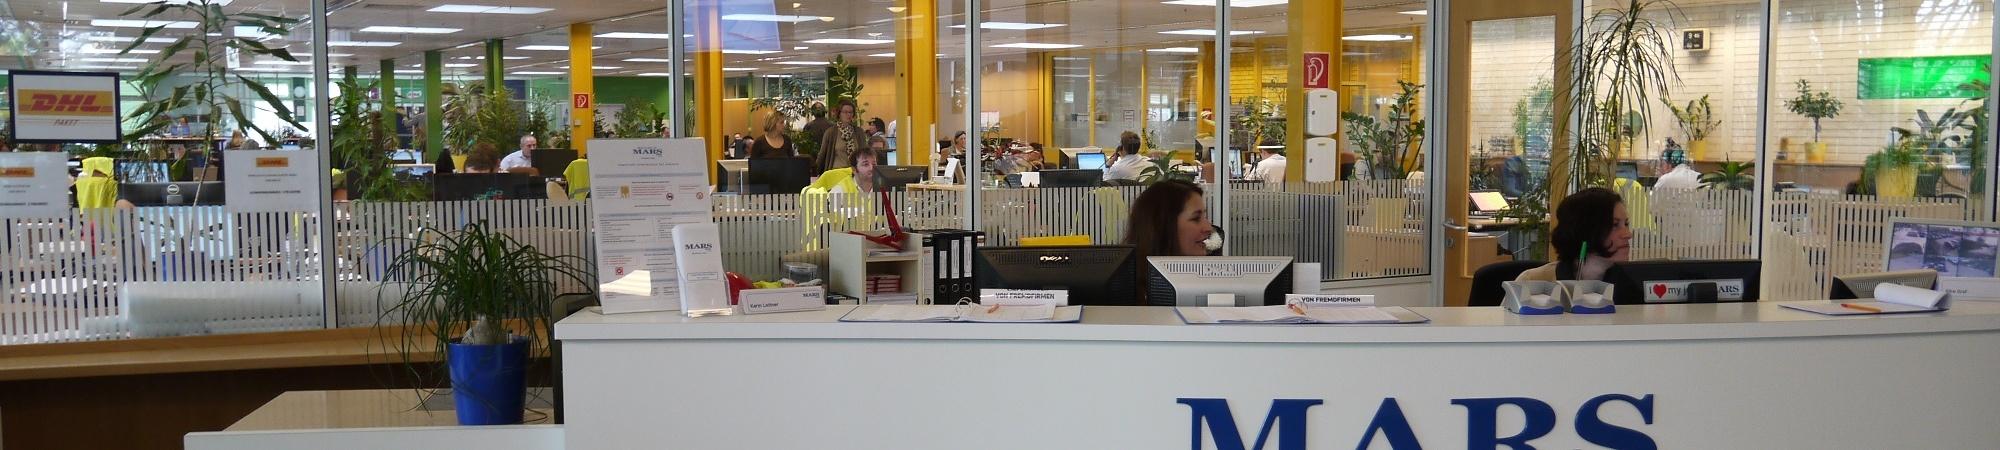 Büroempfang